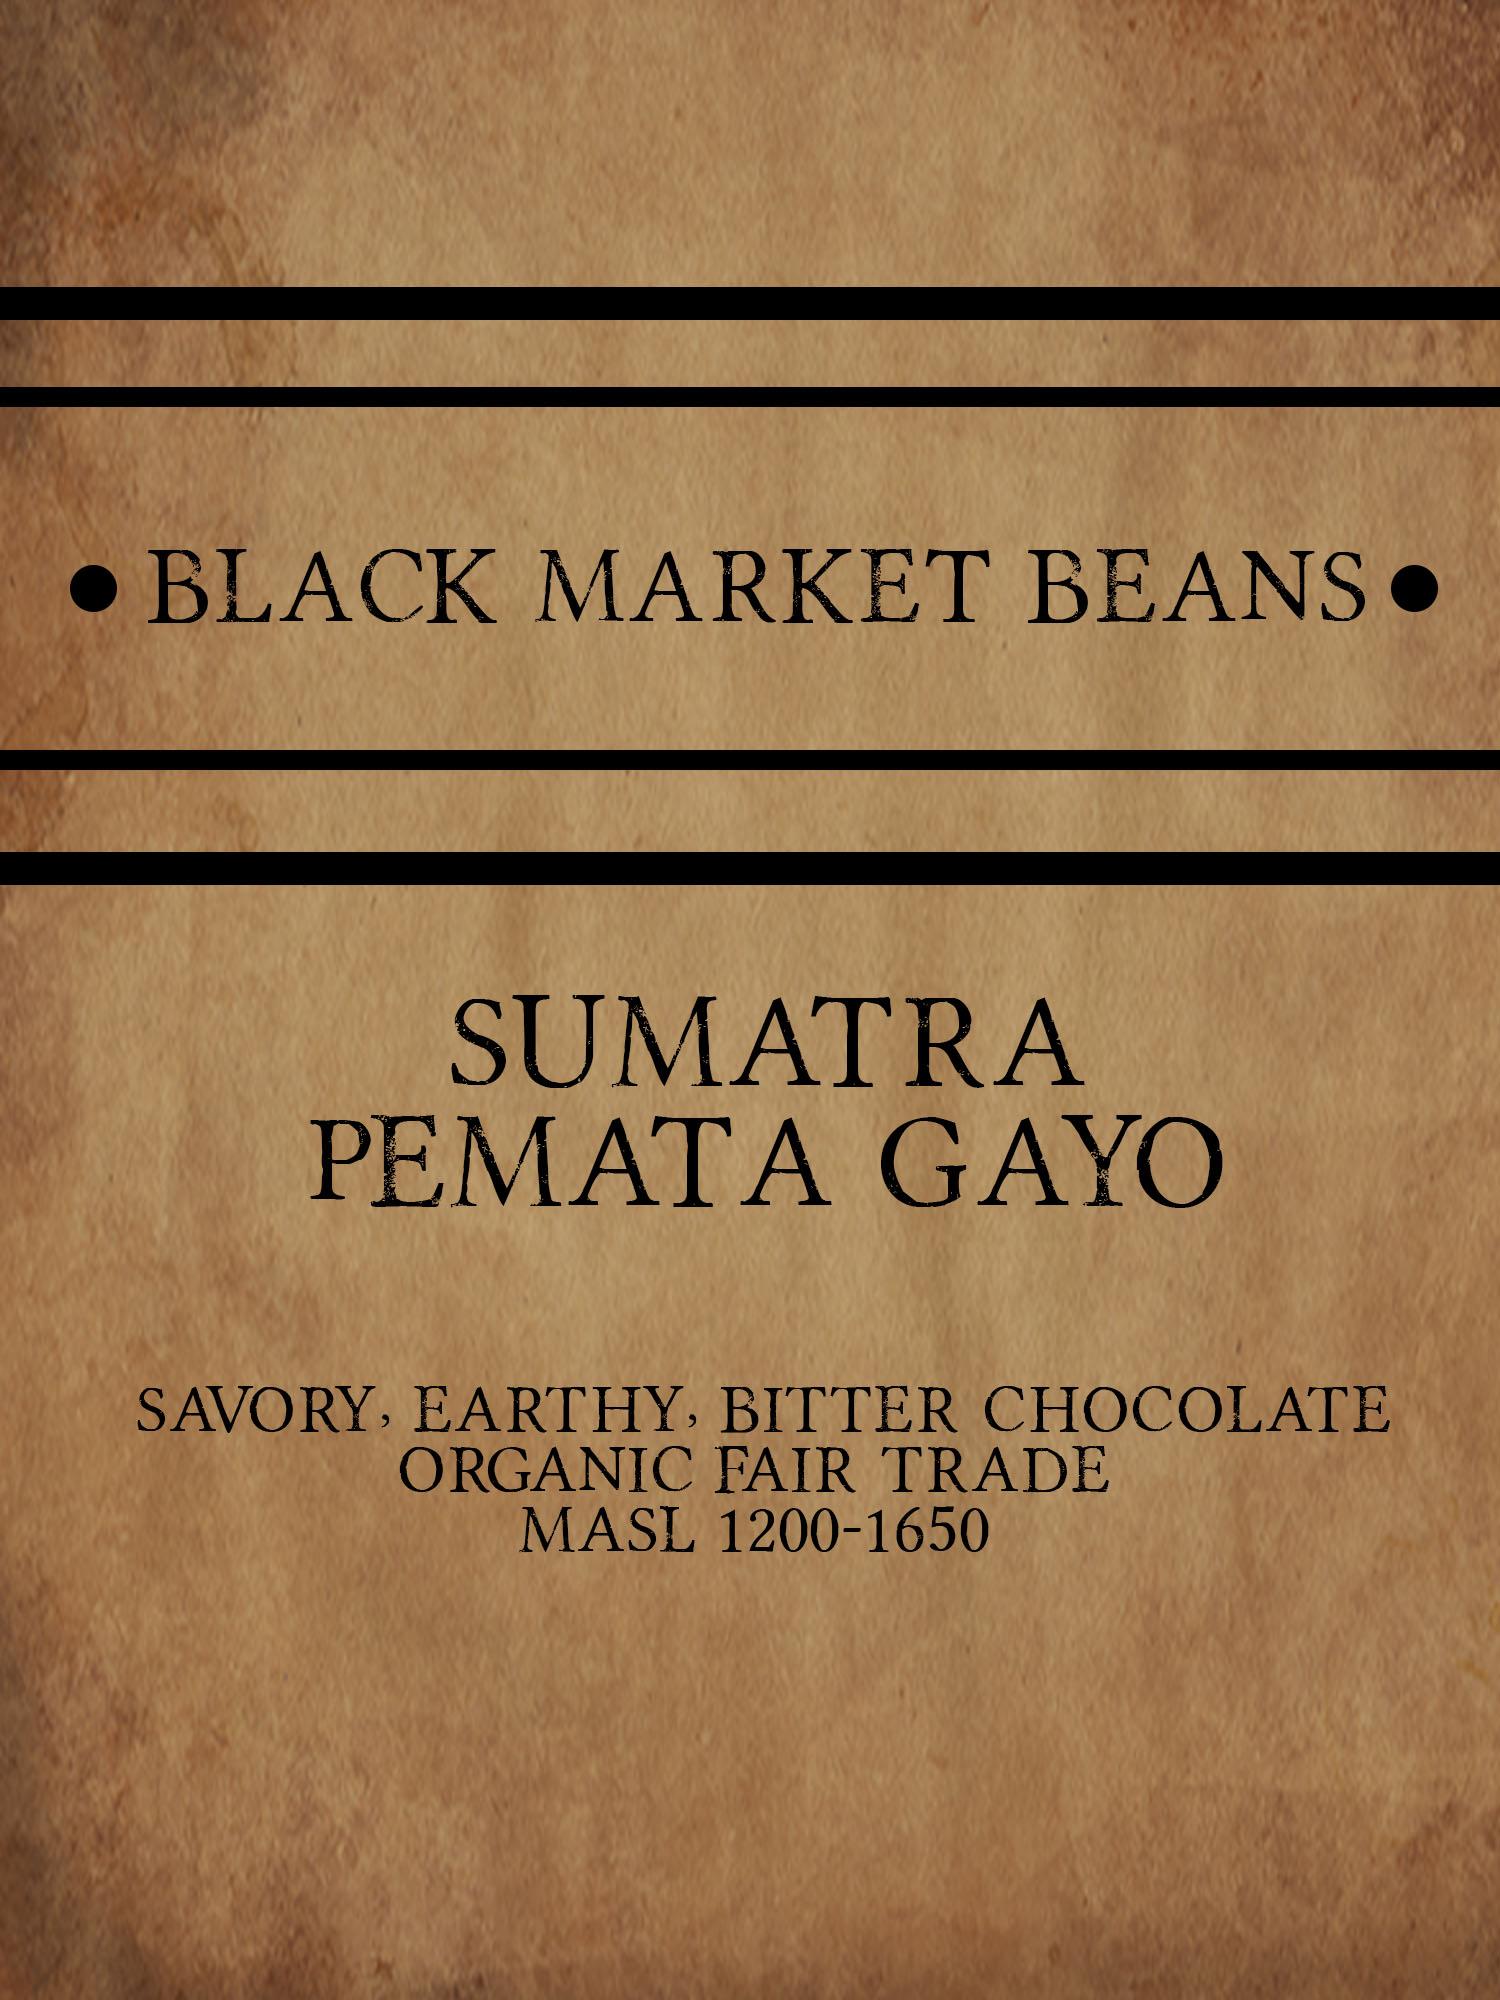 coffee_Sumatra - Permata Gayo.jpg